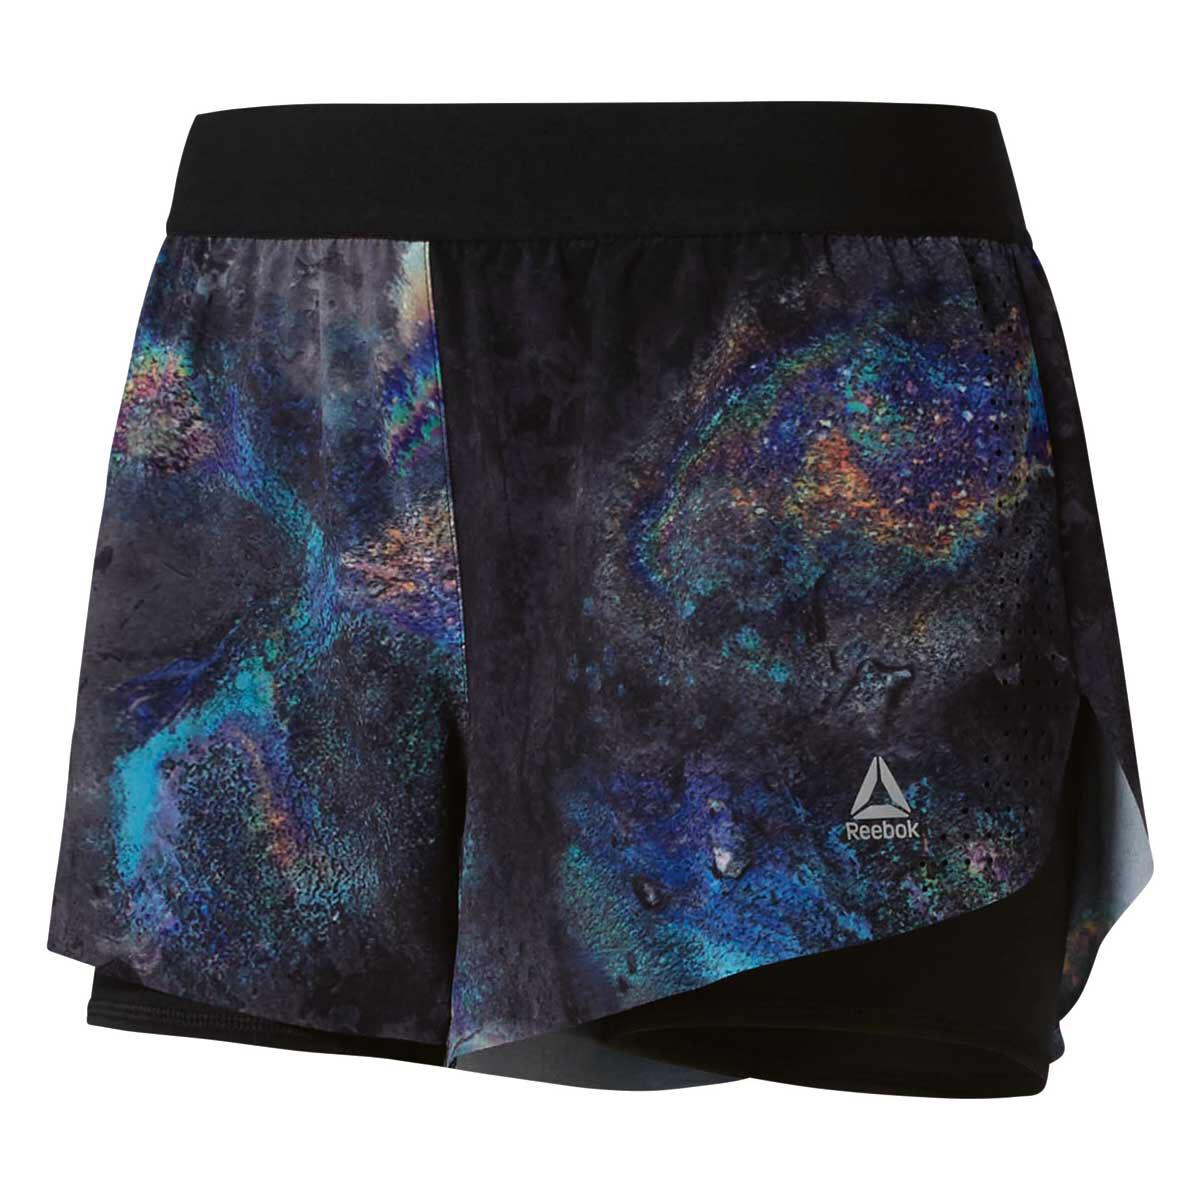 Reebok Womens Oil Slick Epic Shorts